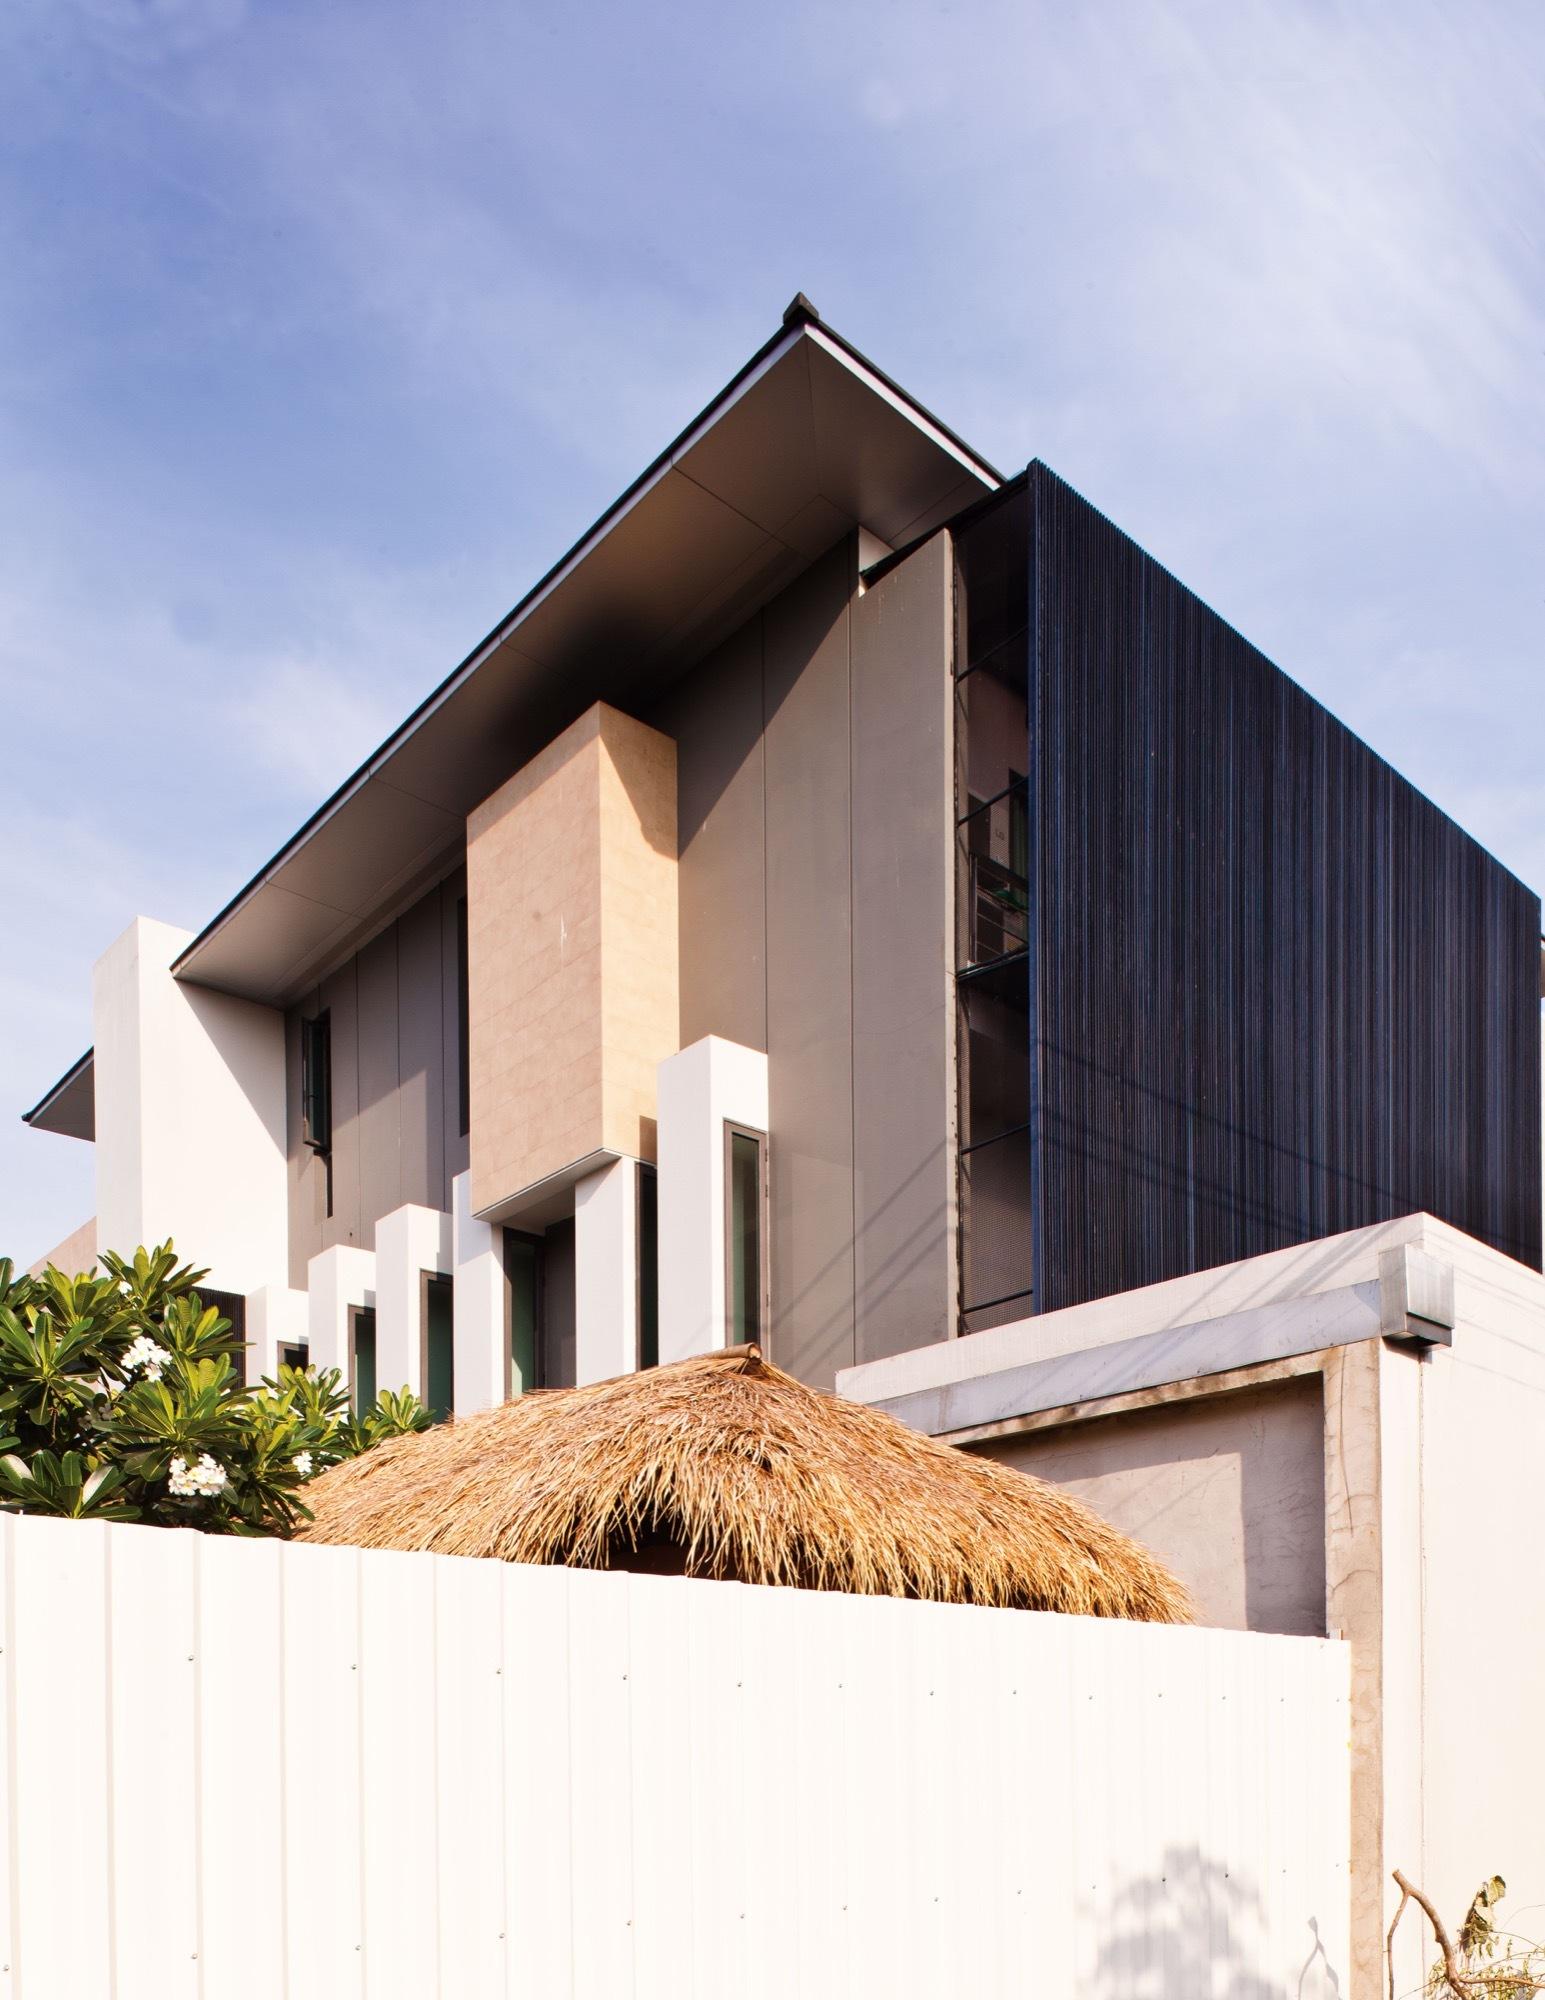 House design thailand - House Design Thailand 56